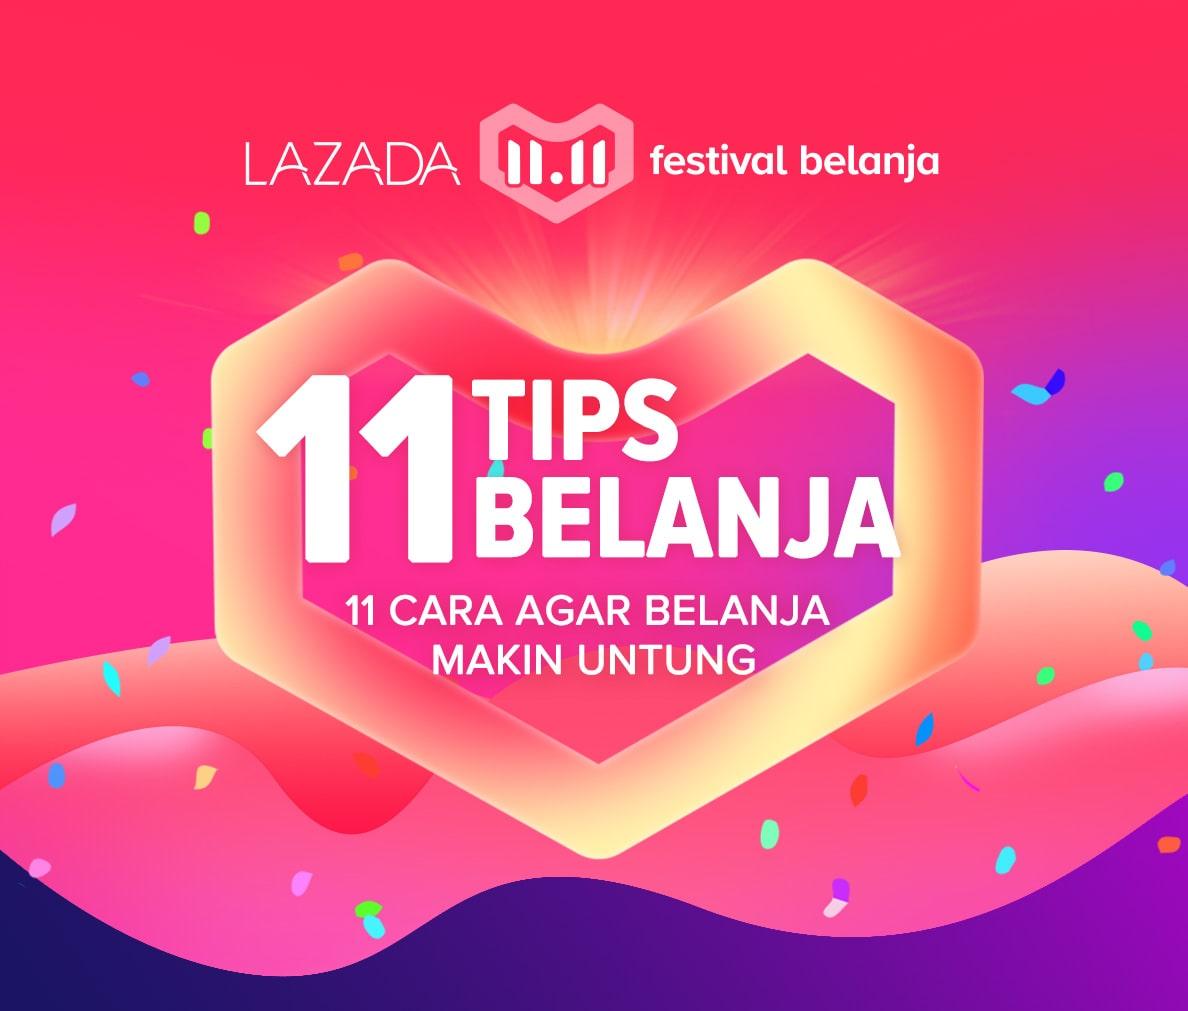 Lazada - Promo Lazada 11.11. Festival Belanja (Tips Belanja 11.11)